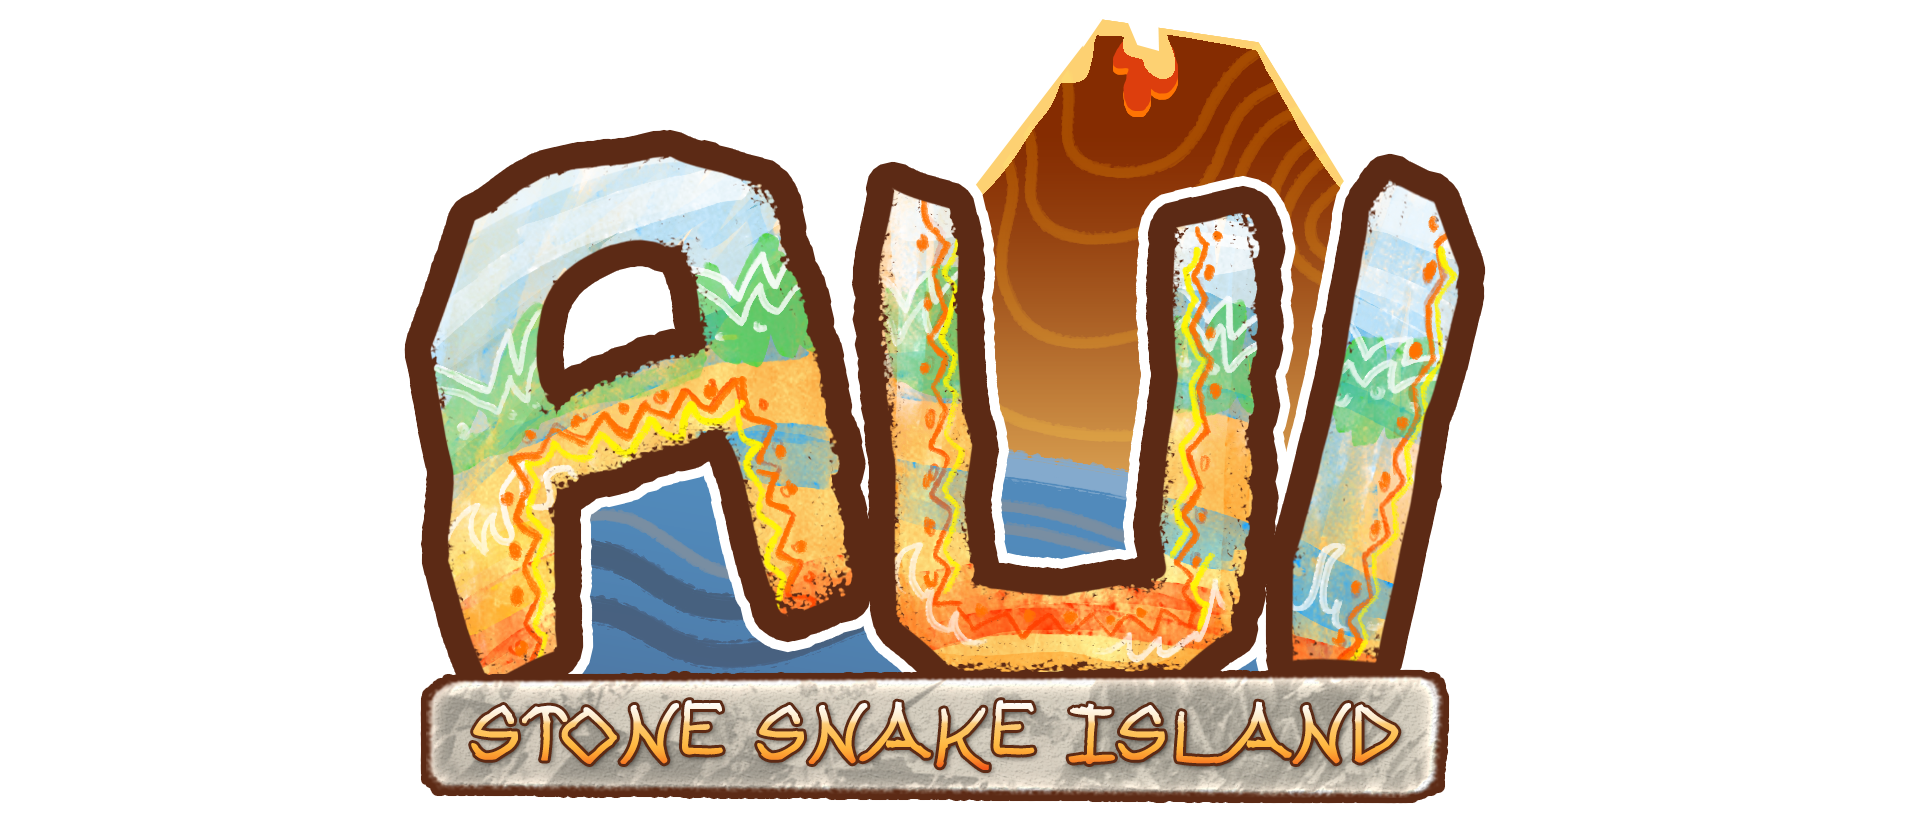 AUI - Stone Snake Island (IGMC2018)